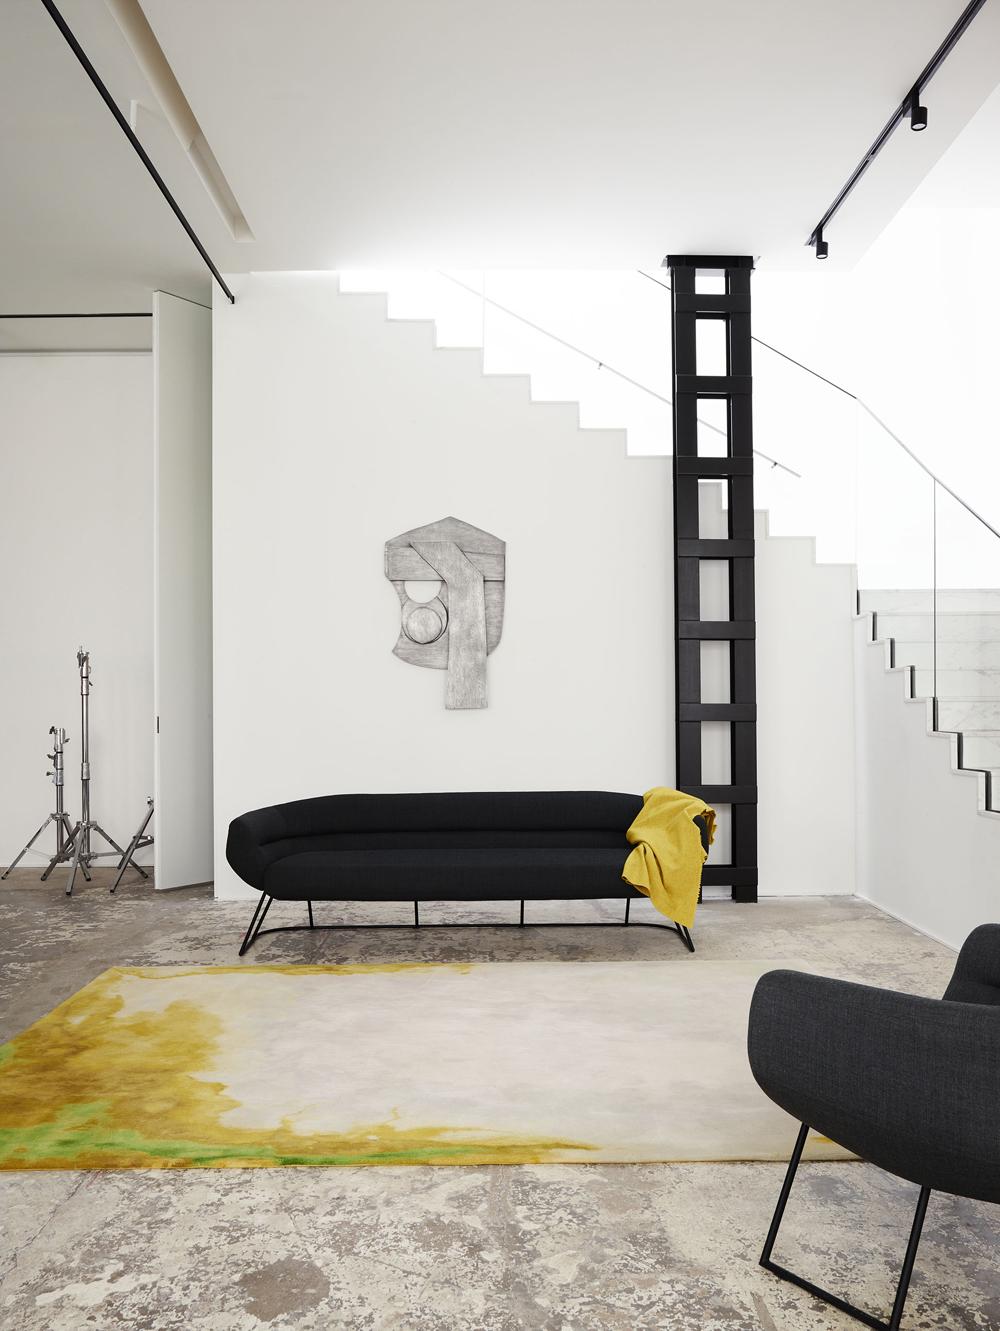 christophe-delcourt-interior-inspiration-11.jpg